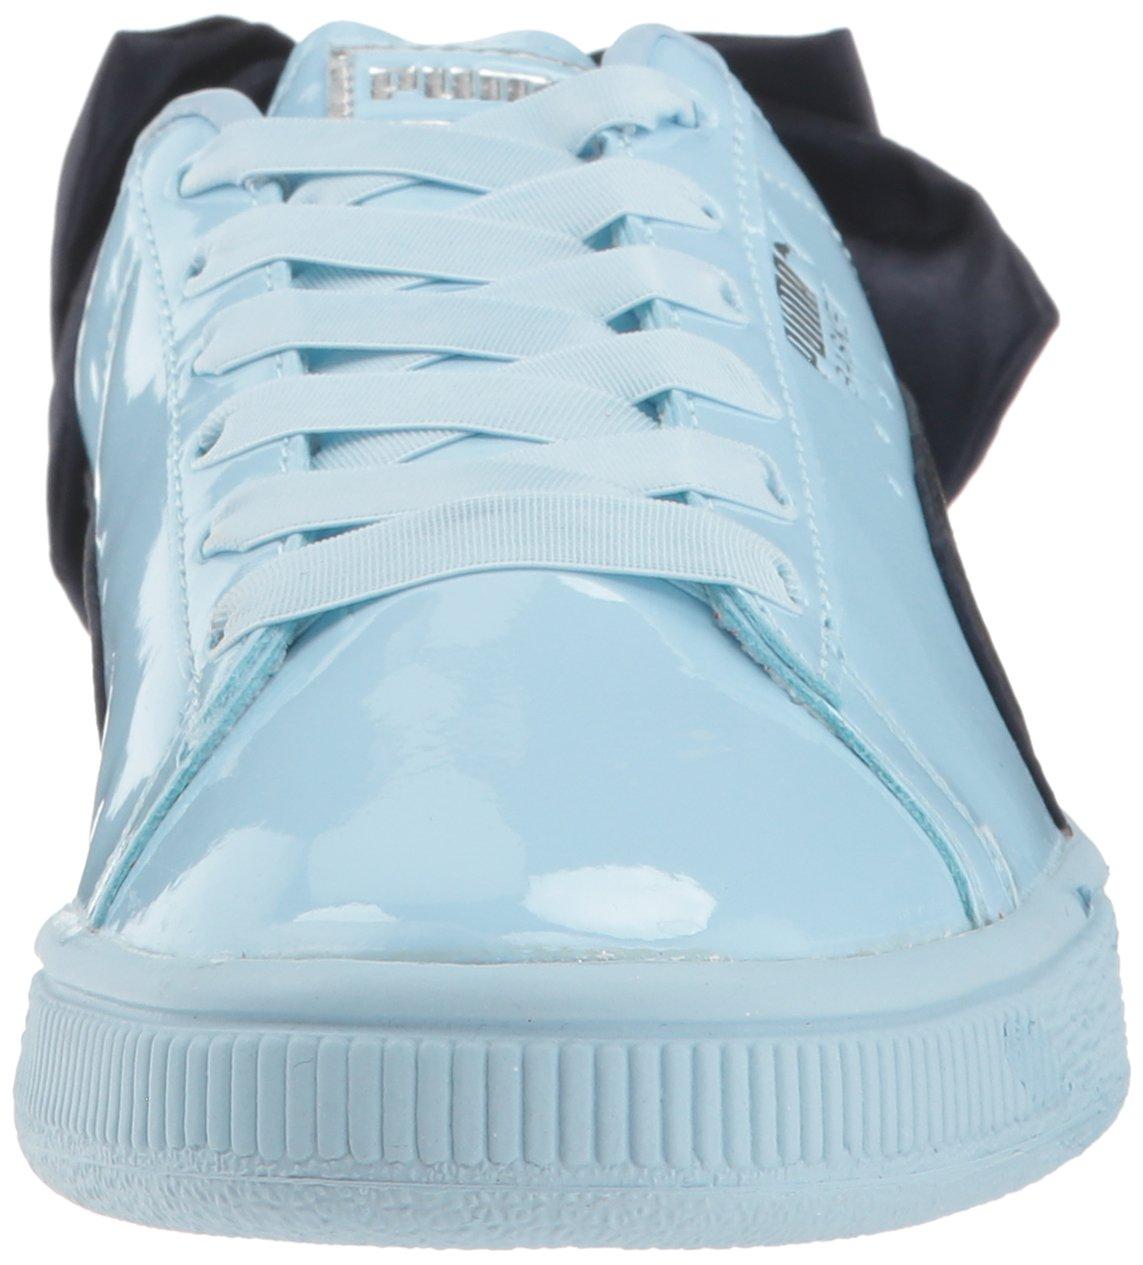 PUMA Unisex-Kids Basket Bow Patent Sneaker, Cerulean-Peacoat, 12 M US Little Kid by PUMA (Image #4)